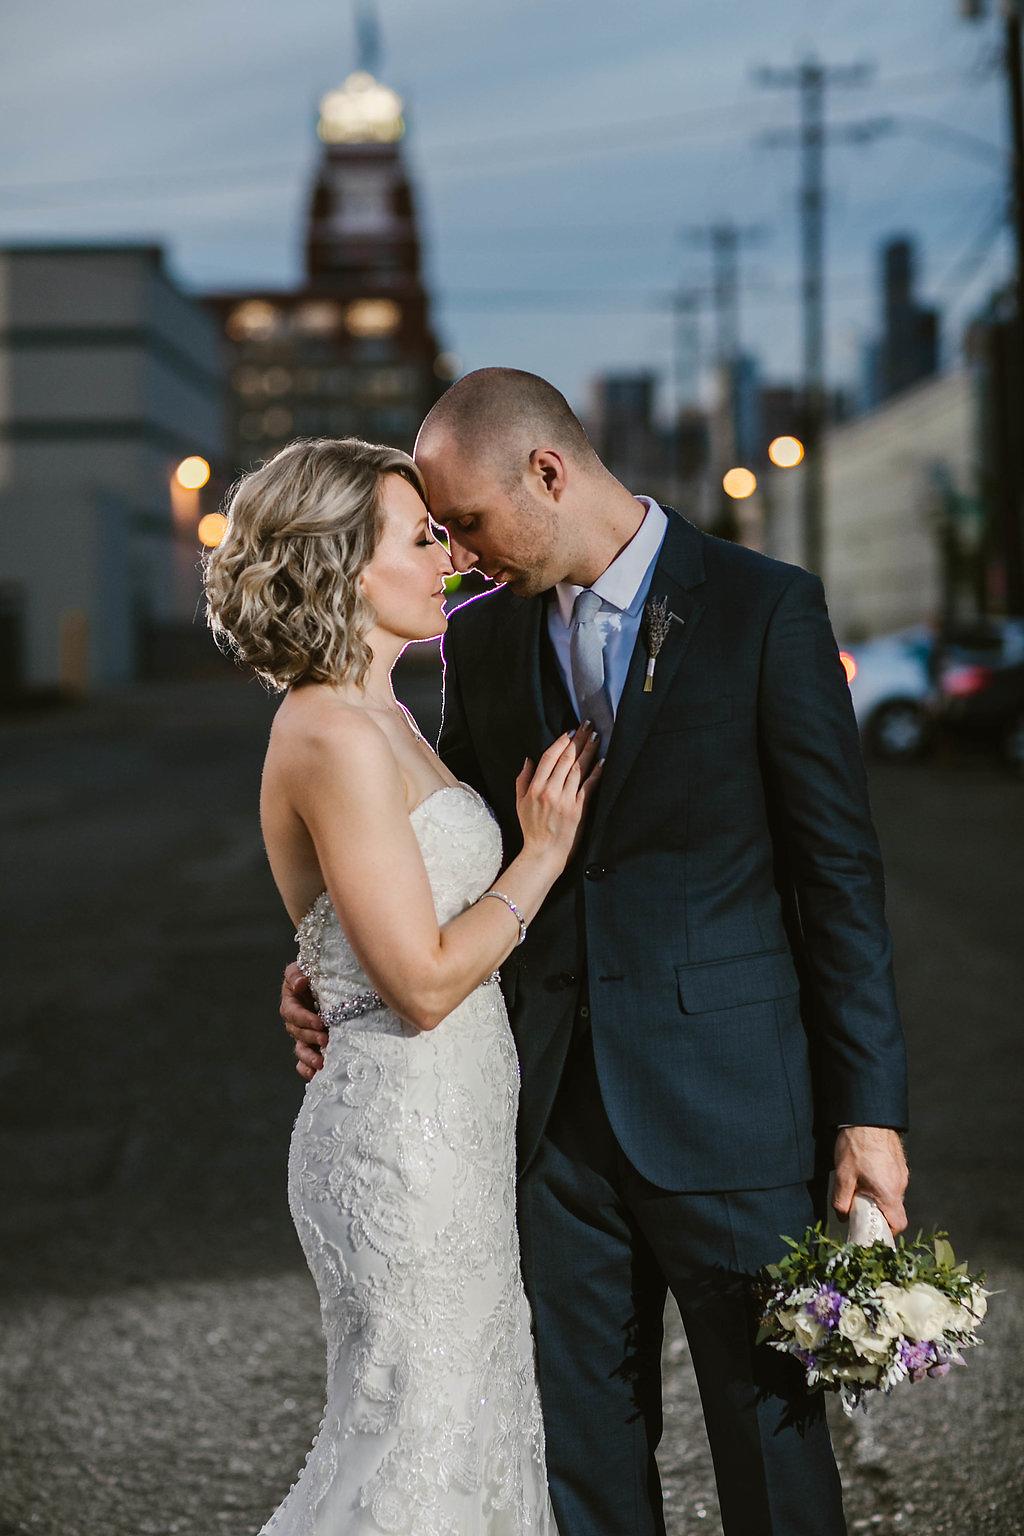 Amy+Clint_Within_Sodo_wedding_seattle_by_Adina_Preston_Weddings_163.JPG